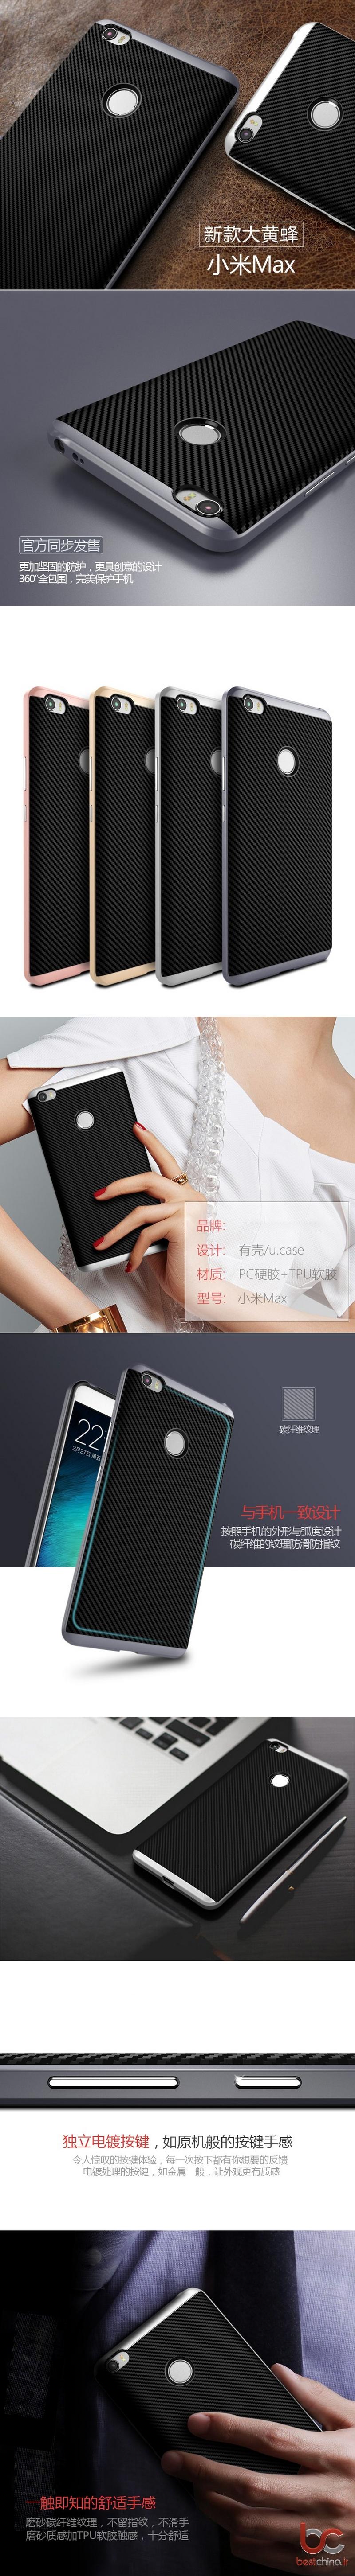 Xiaomi Mi Max iPaky Back Cover (1)